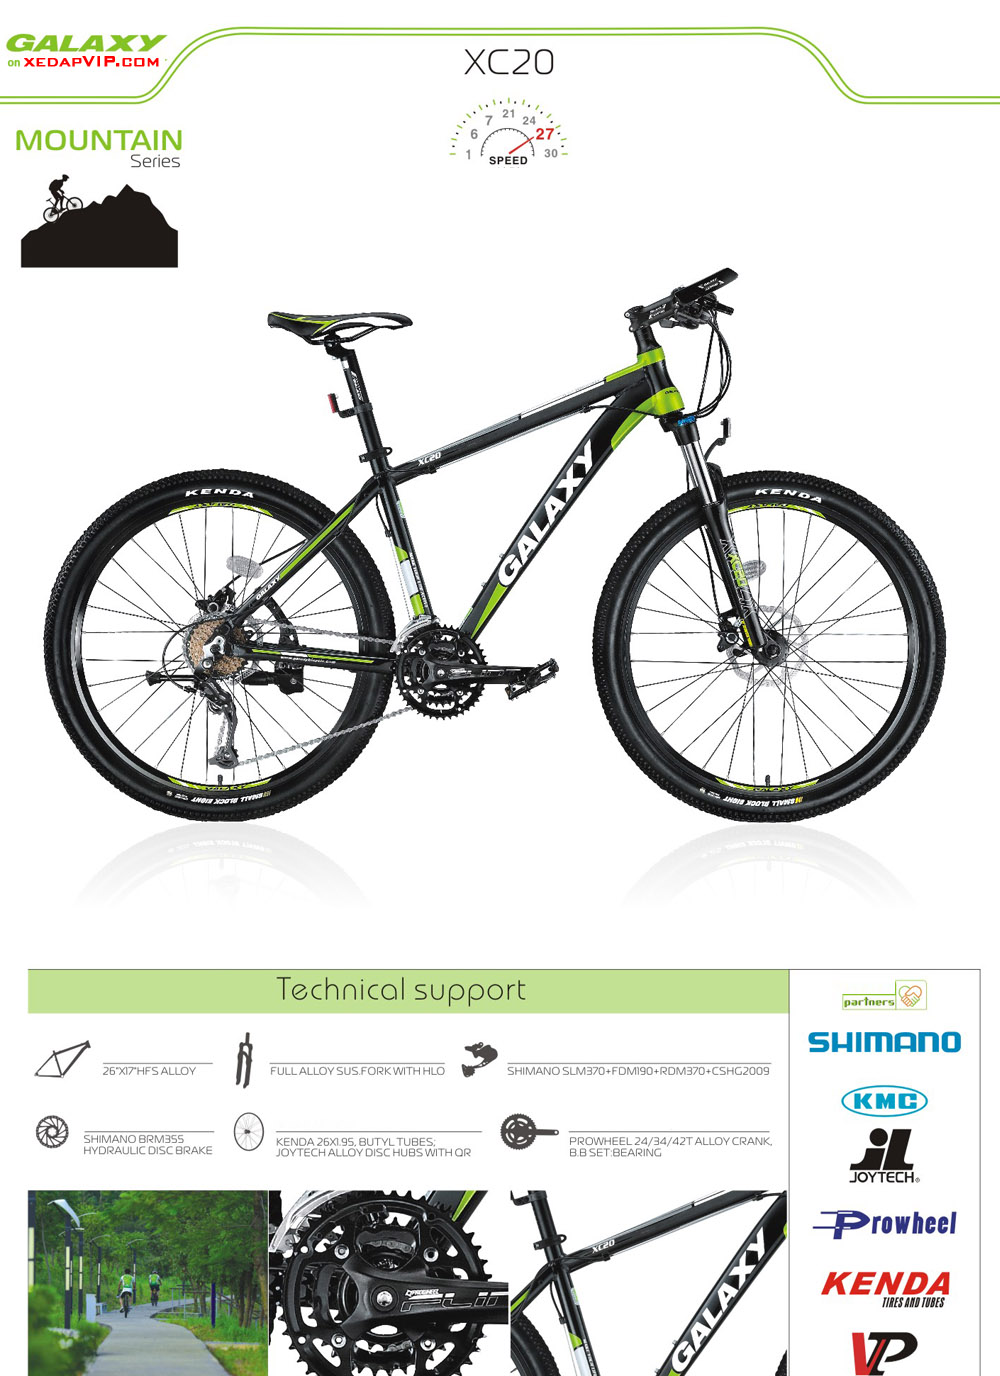 Xe dap the thao GALAXY XC20, xe dap the thao, xe dap trinx, xe đạp thể thao chính hãng, xe dap asama, xc20